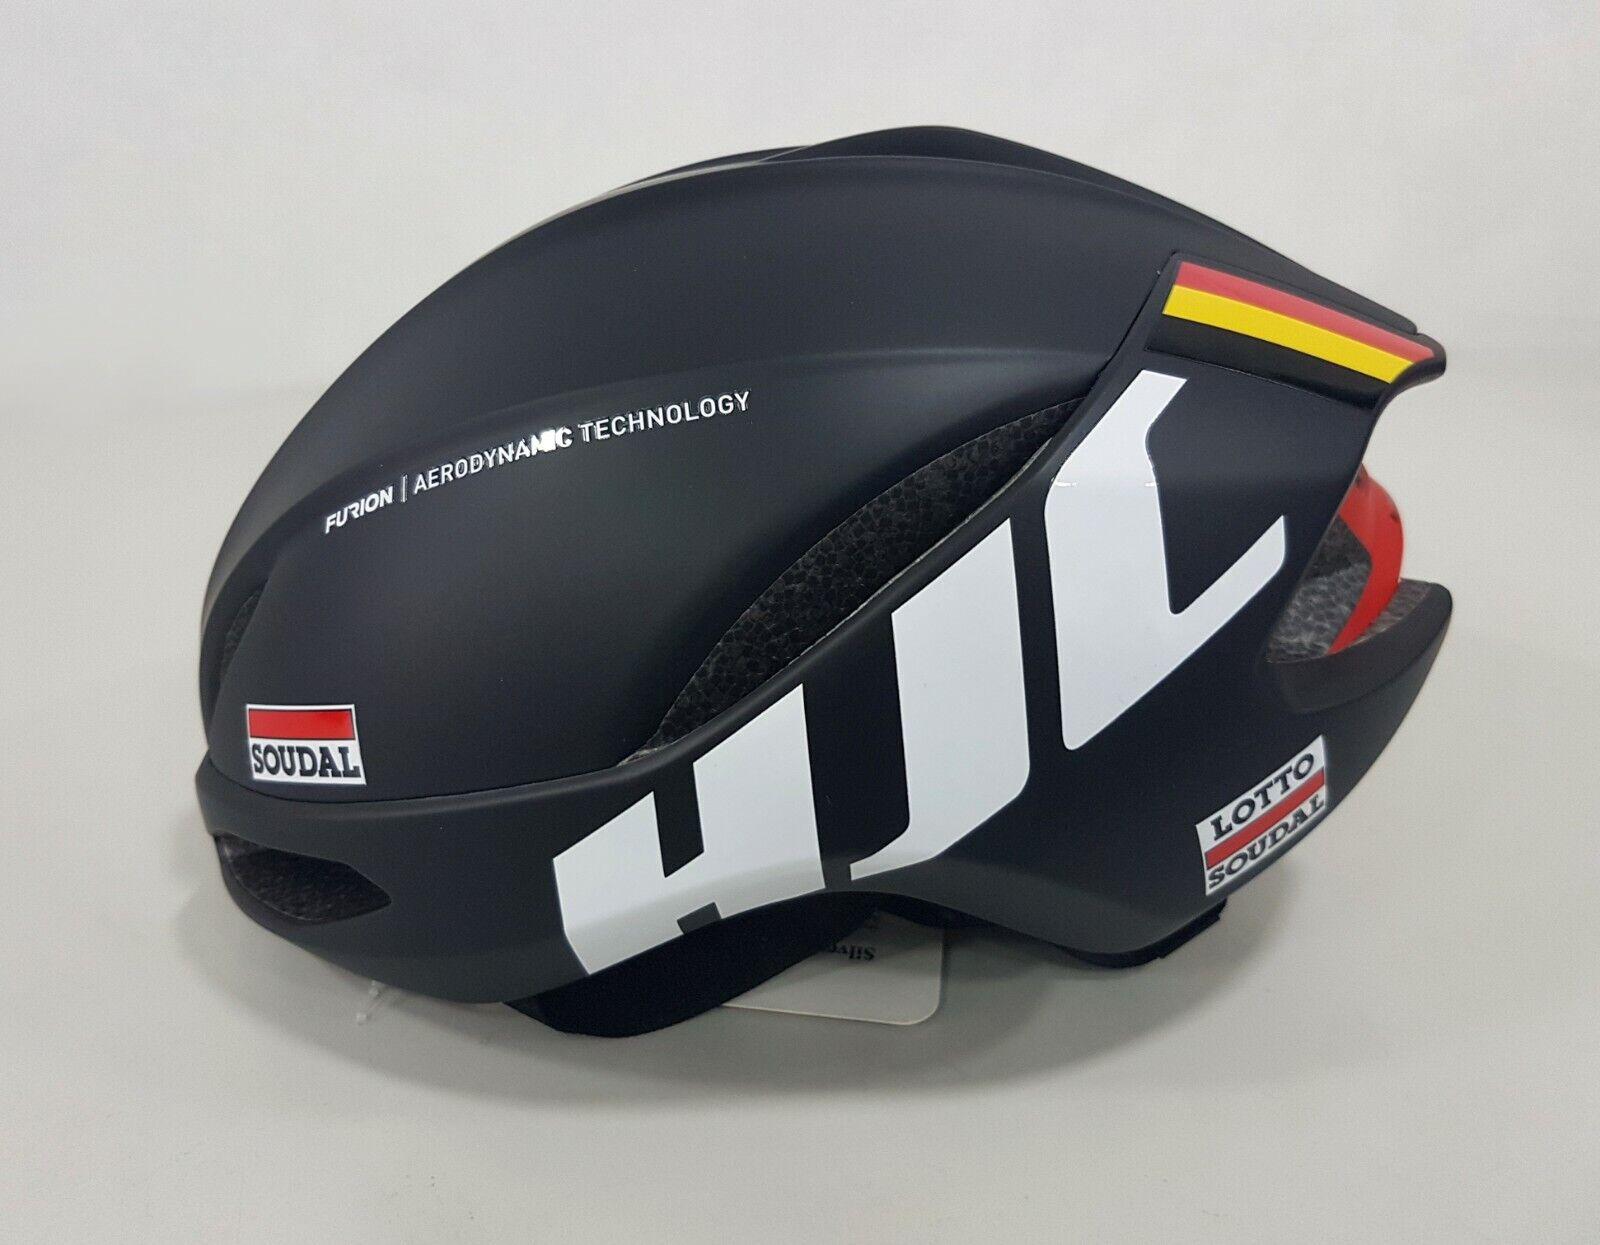 HJC Furion Lotto Soudal 15Vents Aerodynamic Bicycle Road Helmet  51-56cm Size S  buy best